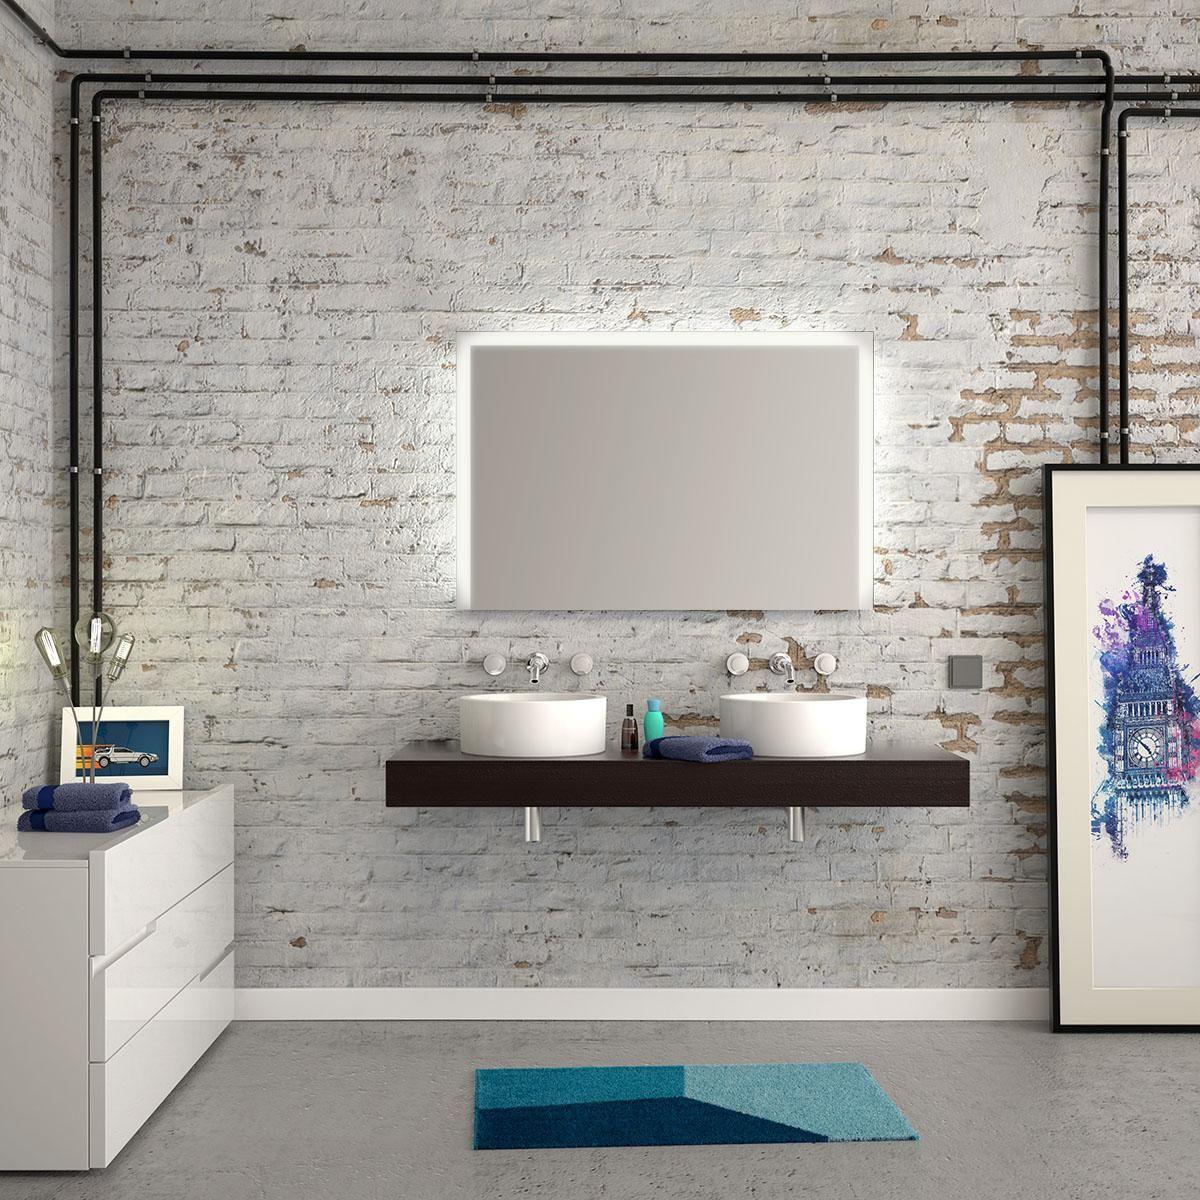 Https Www Trenvay Com Banyo Aynasi Pmu273 Badspiegel Led Badspiegel Neues Badezimmer